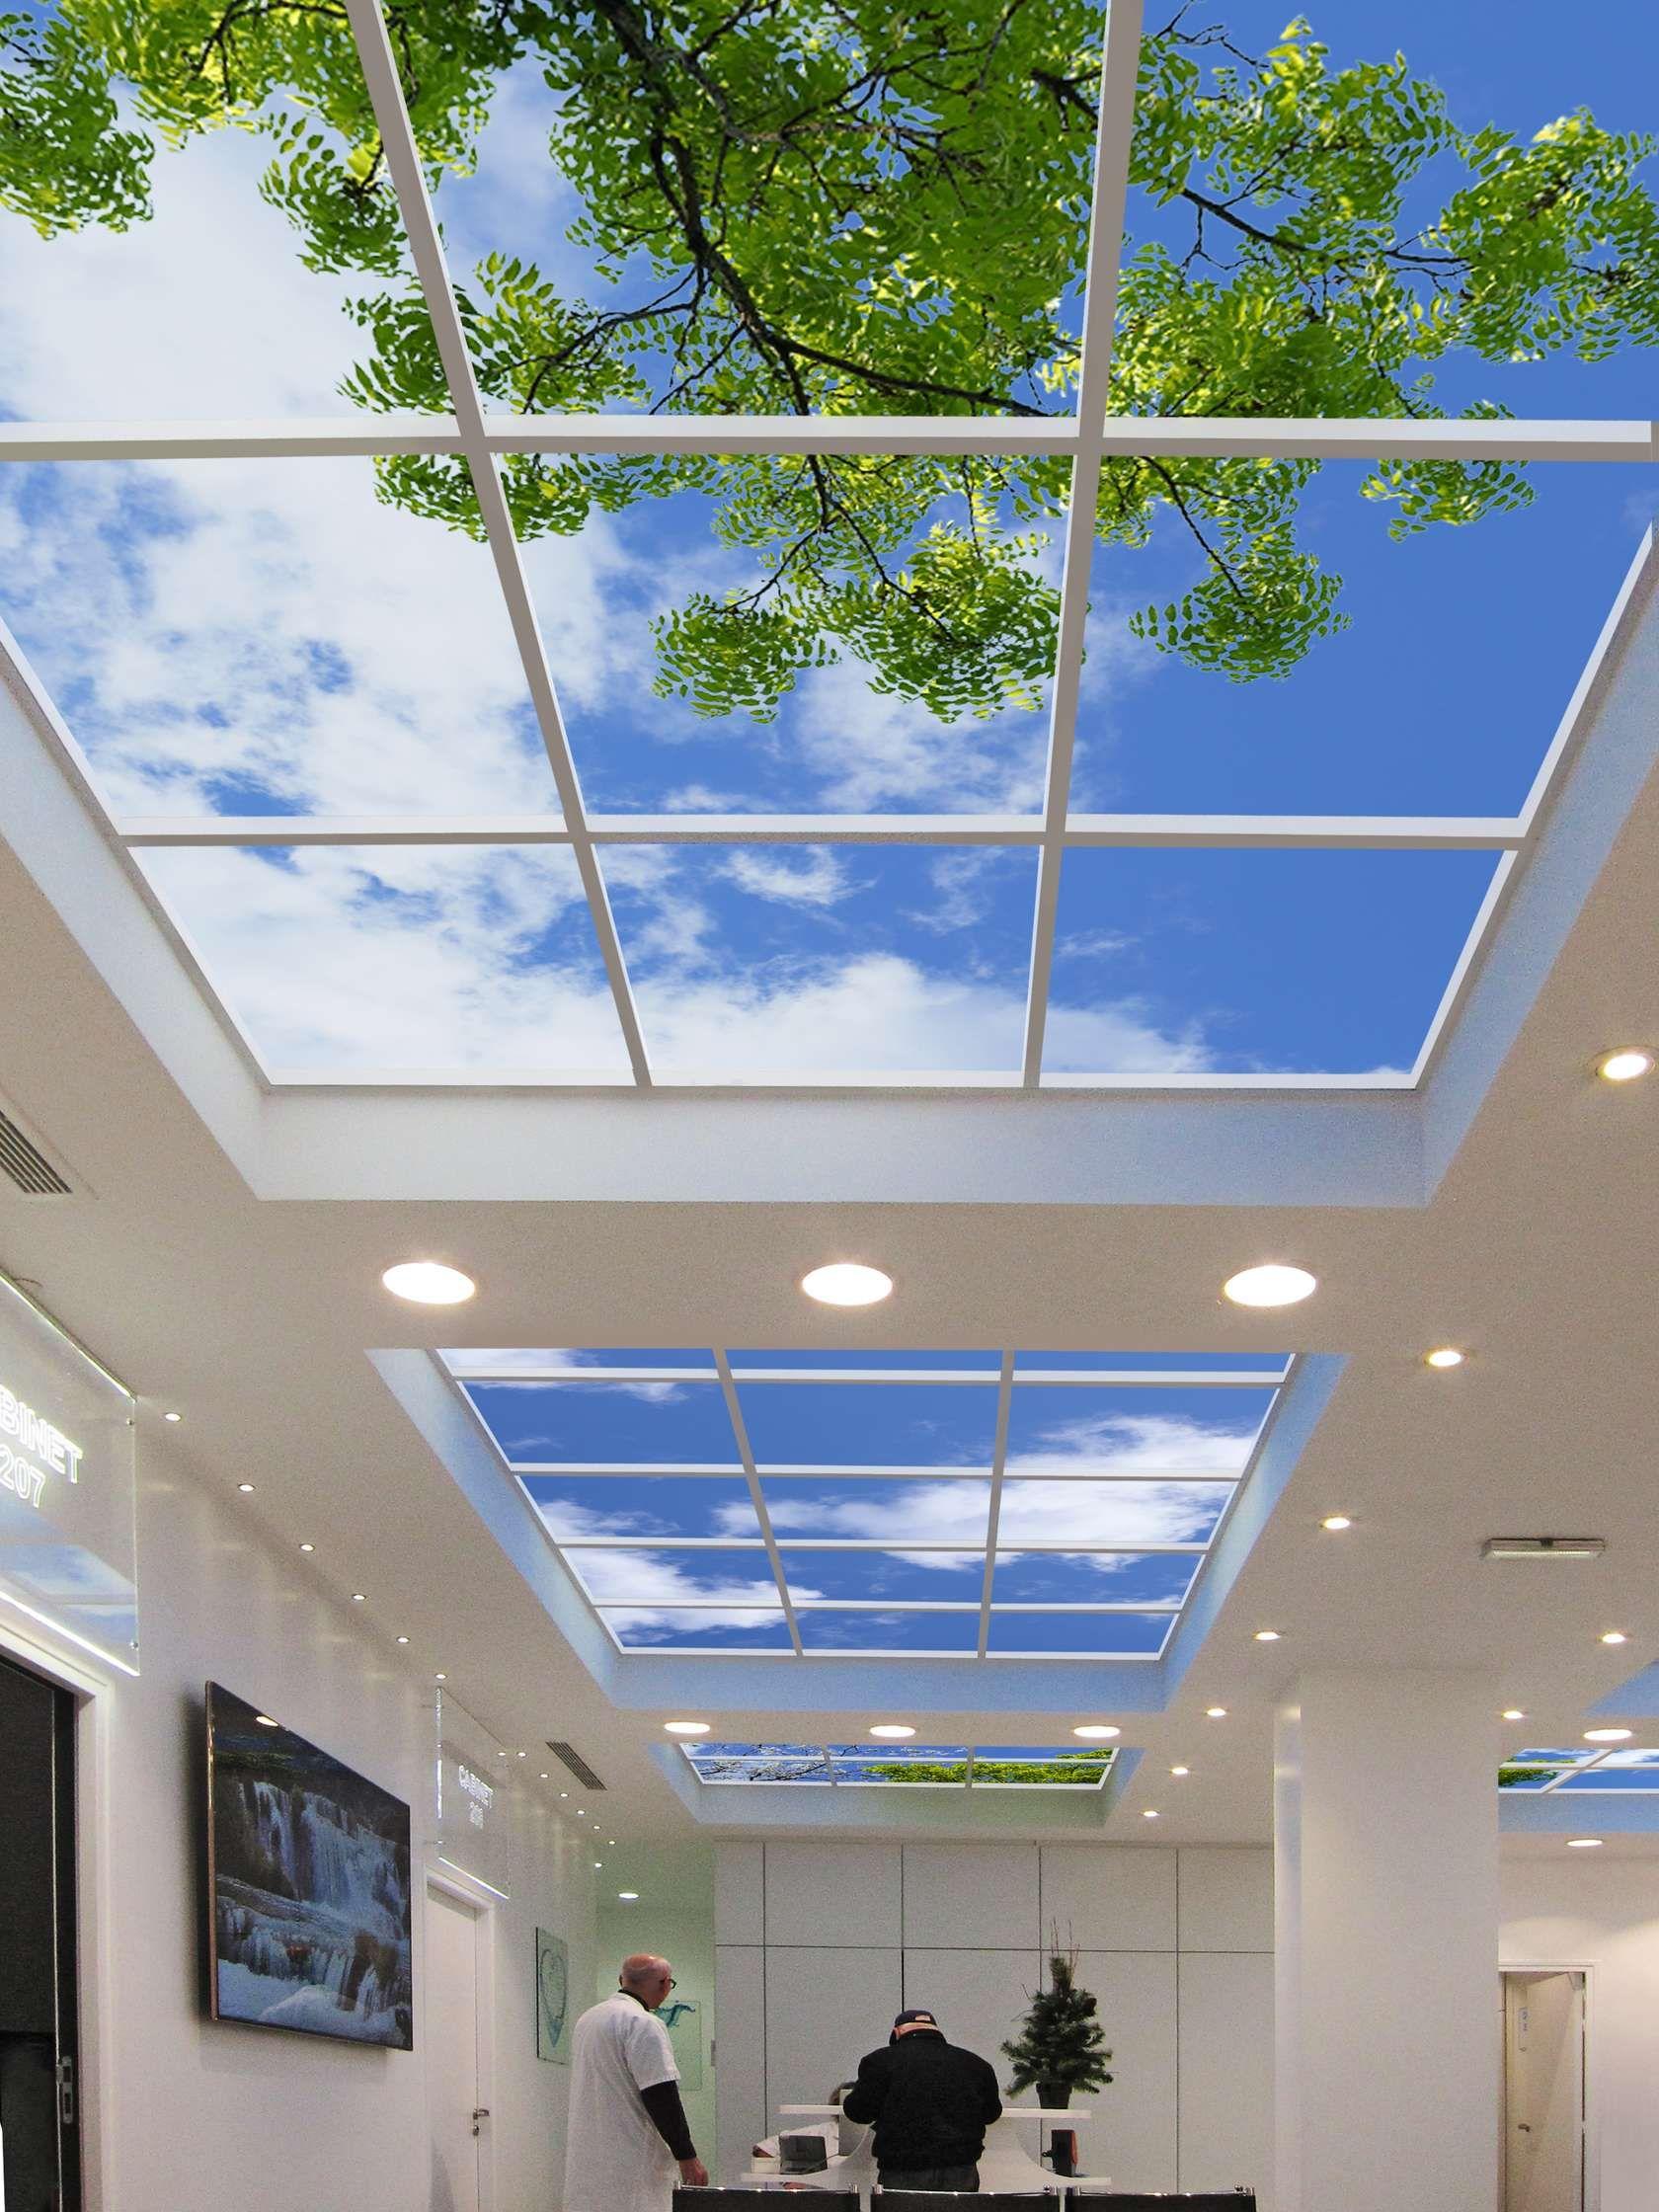 virtual sky ceiling سقف مجازی